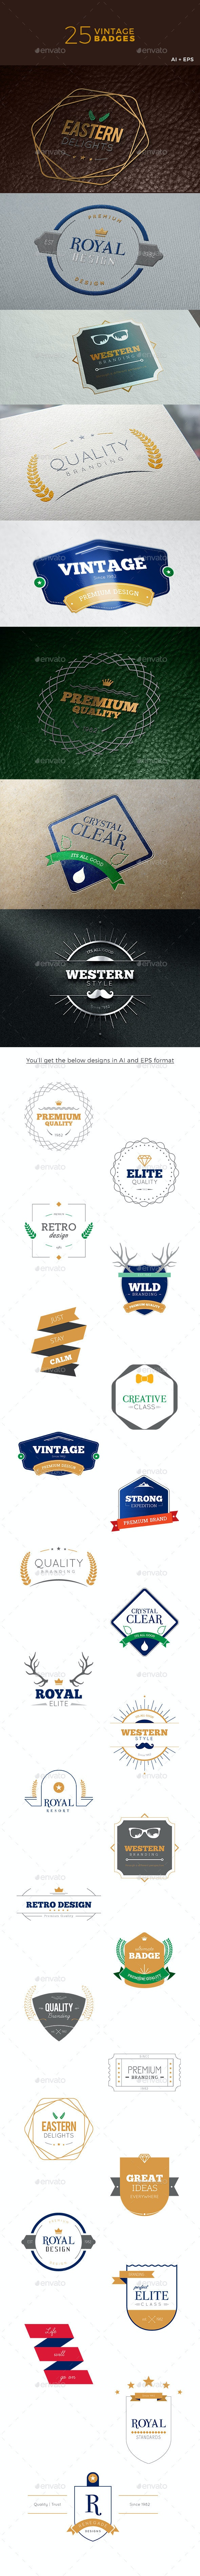 Vintage Badges - Badges & Stickers Web Elements